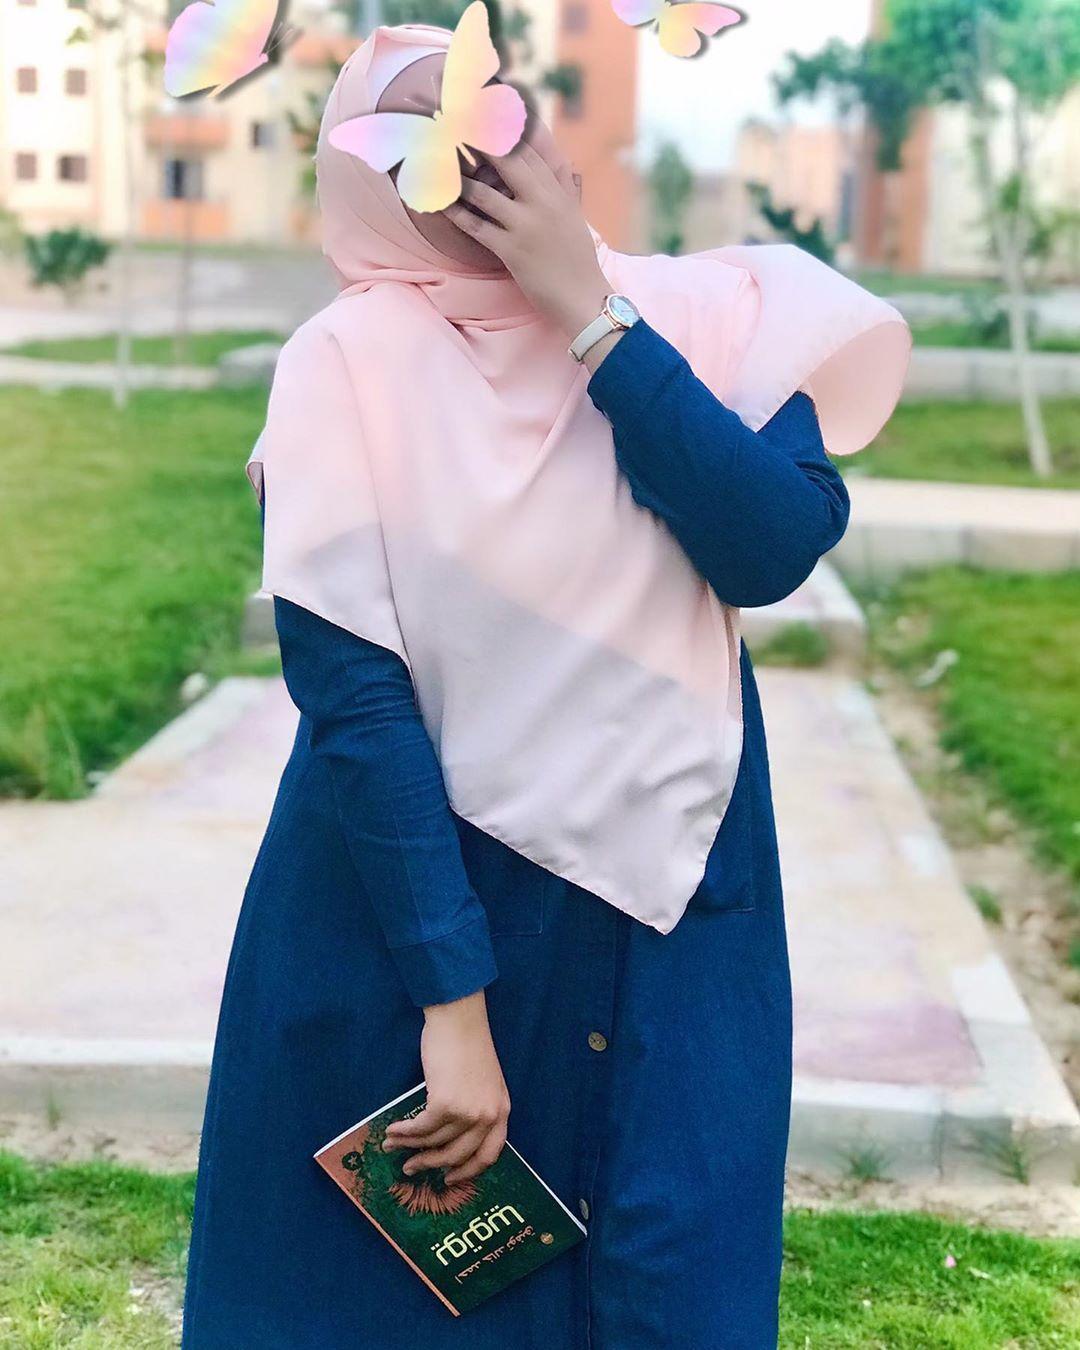 33 Likes 3 Comments Dina Salah Dinas Mohammed On Instagram الحياه هي المعلم الوحيد لك قف لحظه عند هذه الجمله و انطقه Hijab Dress Fashion Muslimah